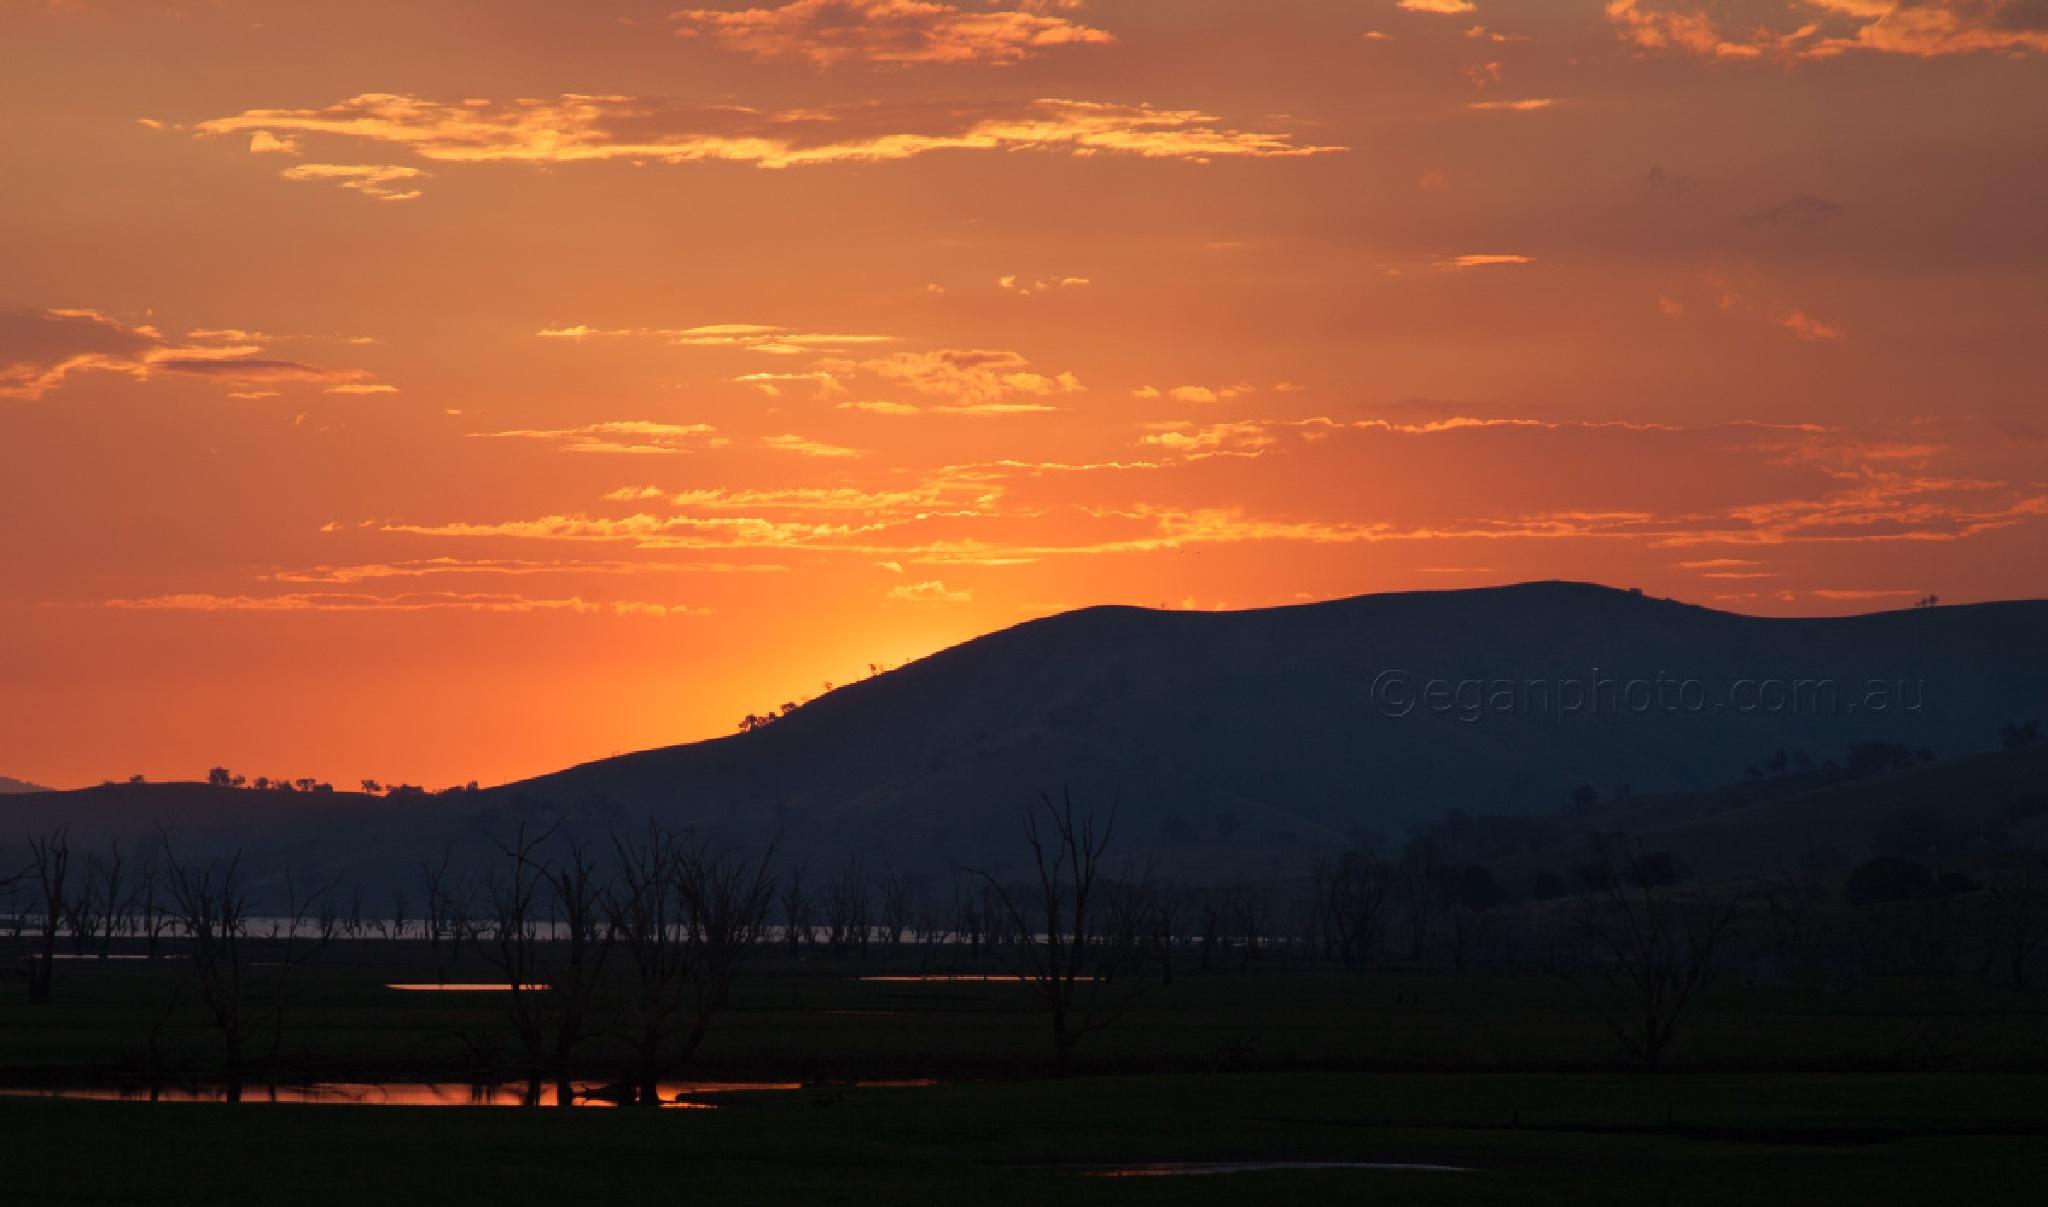 Sunset Light on Billabongs by Mick Egan